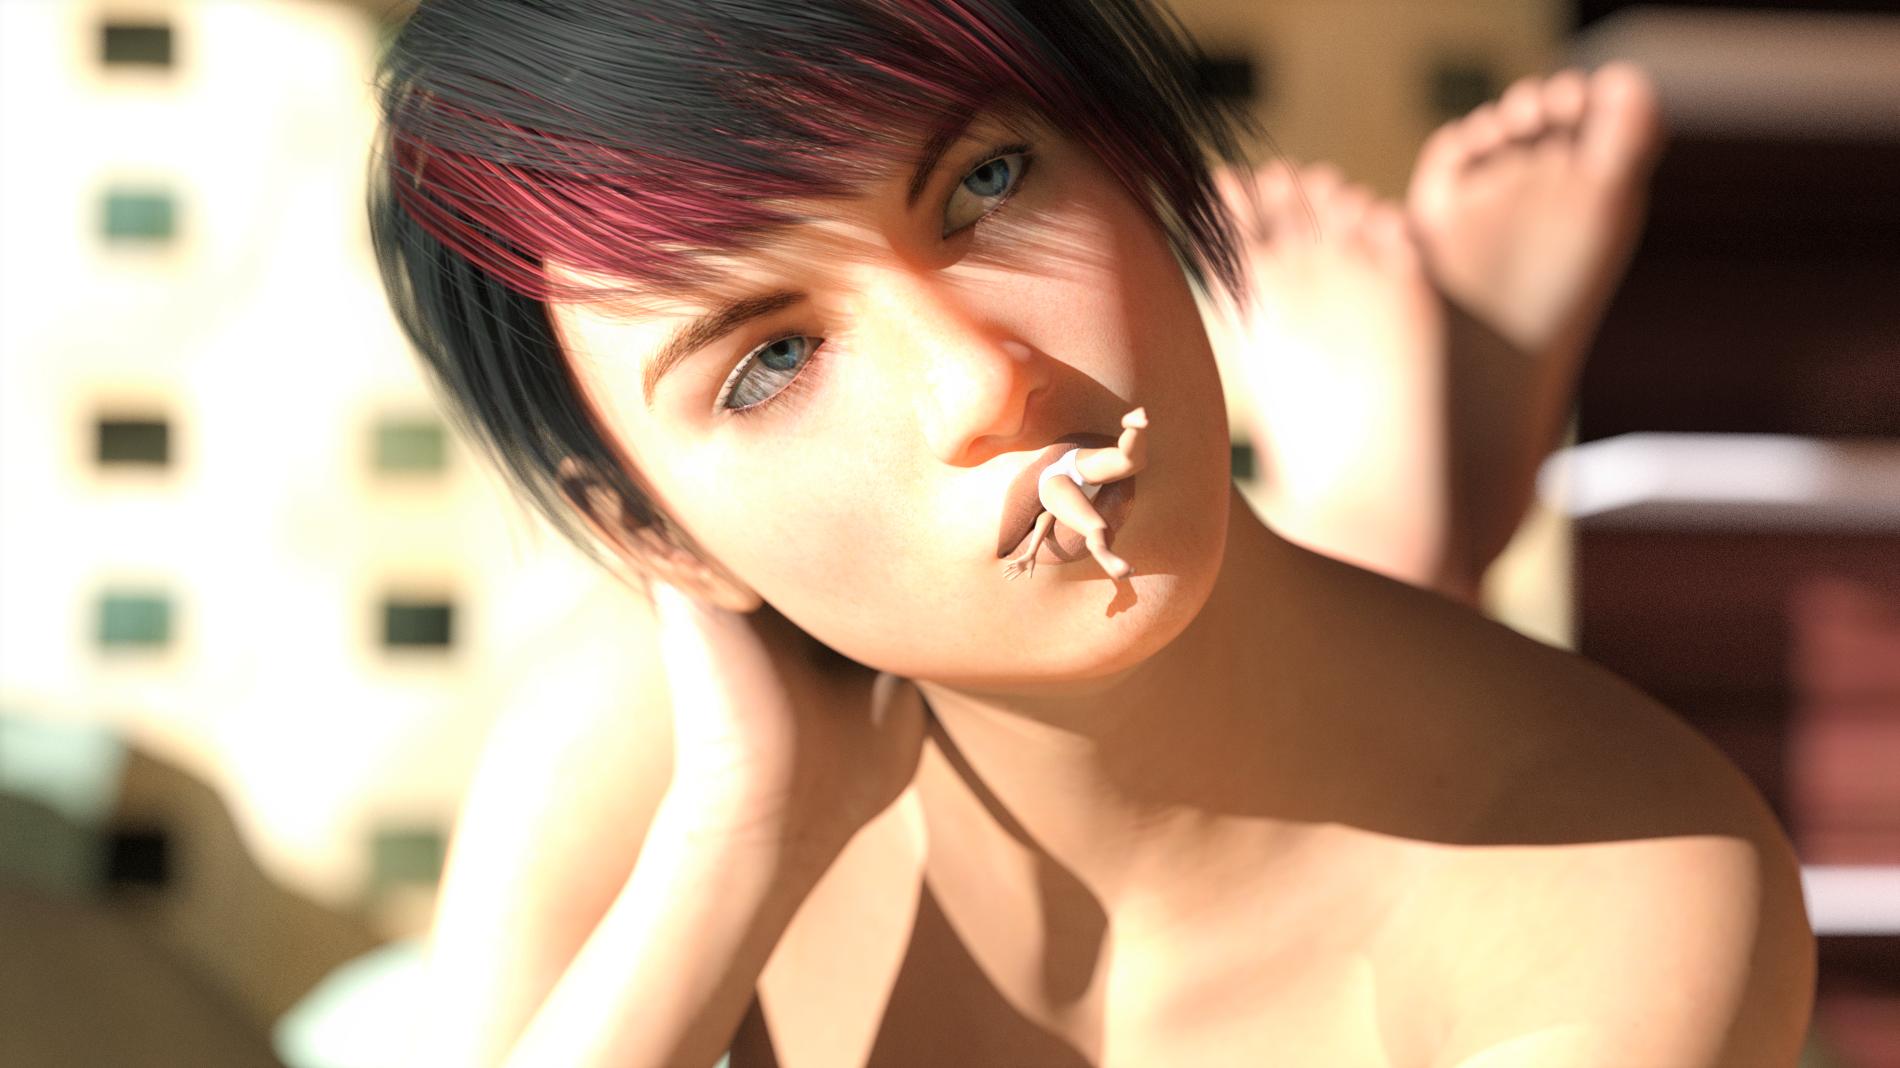 Giantess 3d ResizeMe!